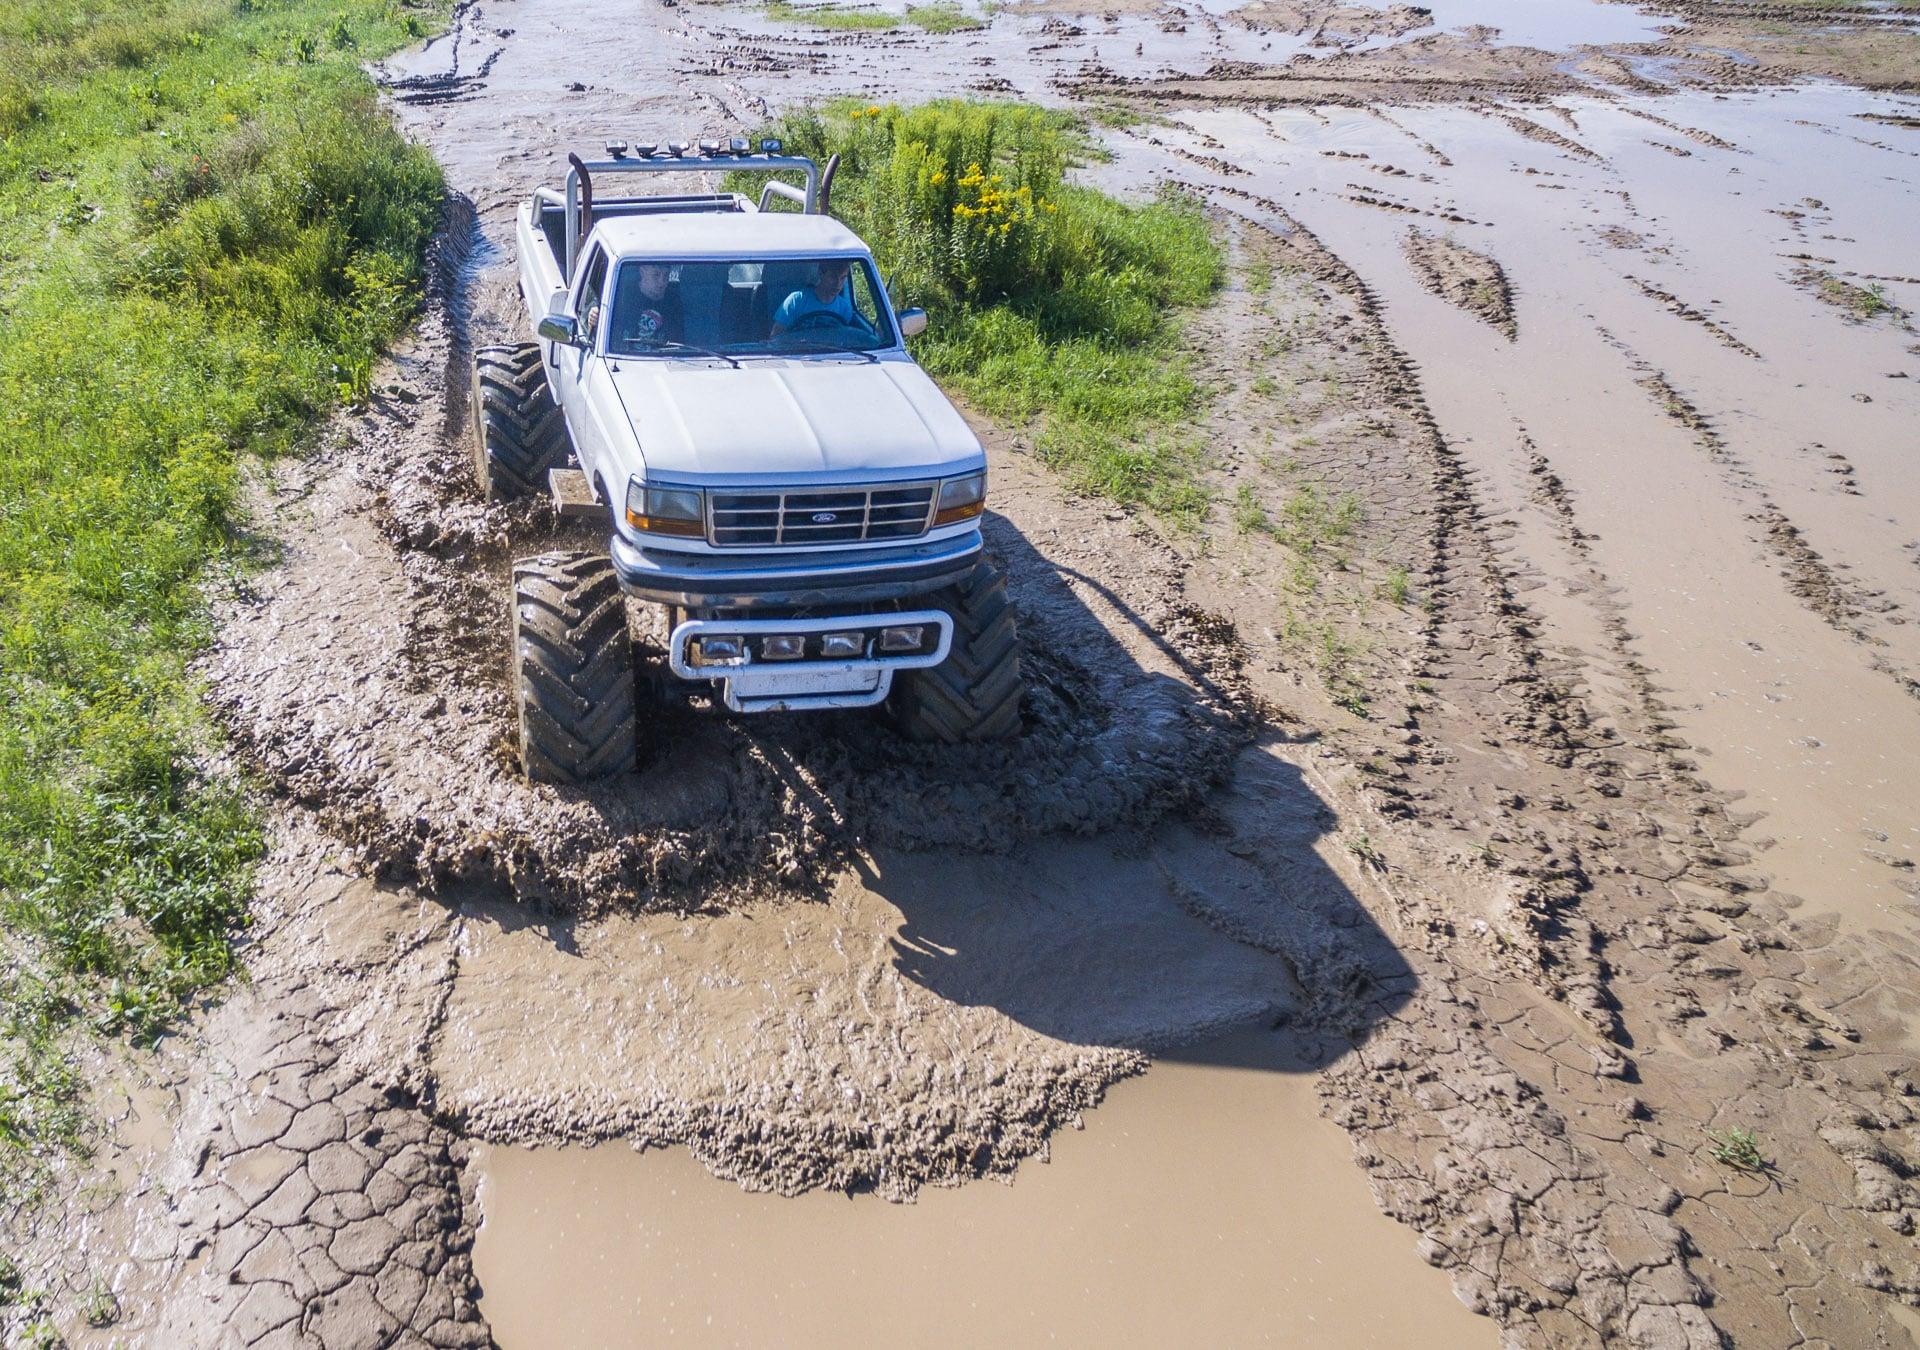 Monster truck - jazda